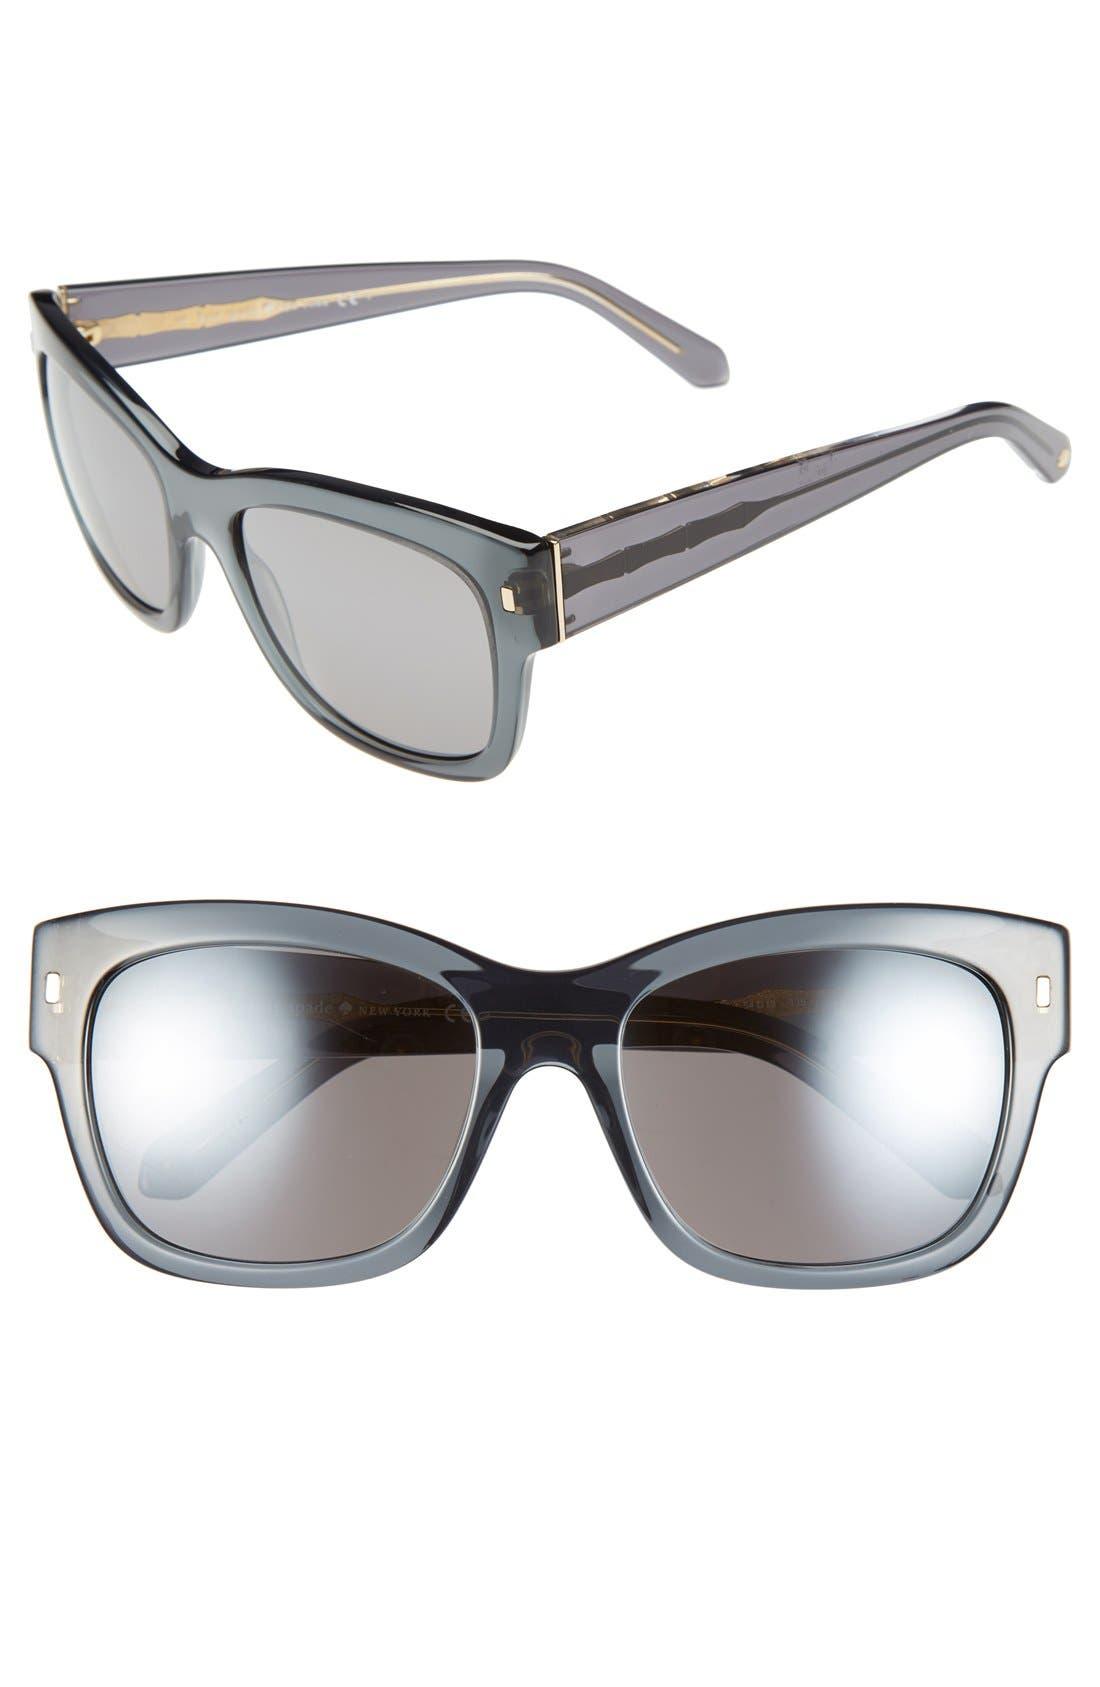 Main Image - kate spade new york 'tahira' 54mm retro sunglasses